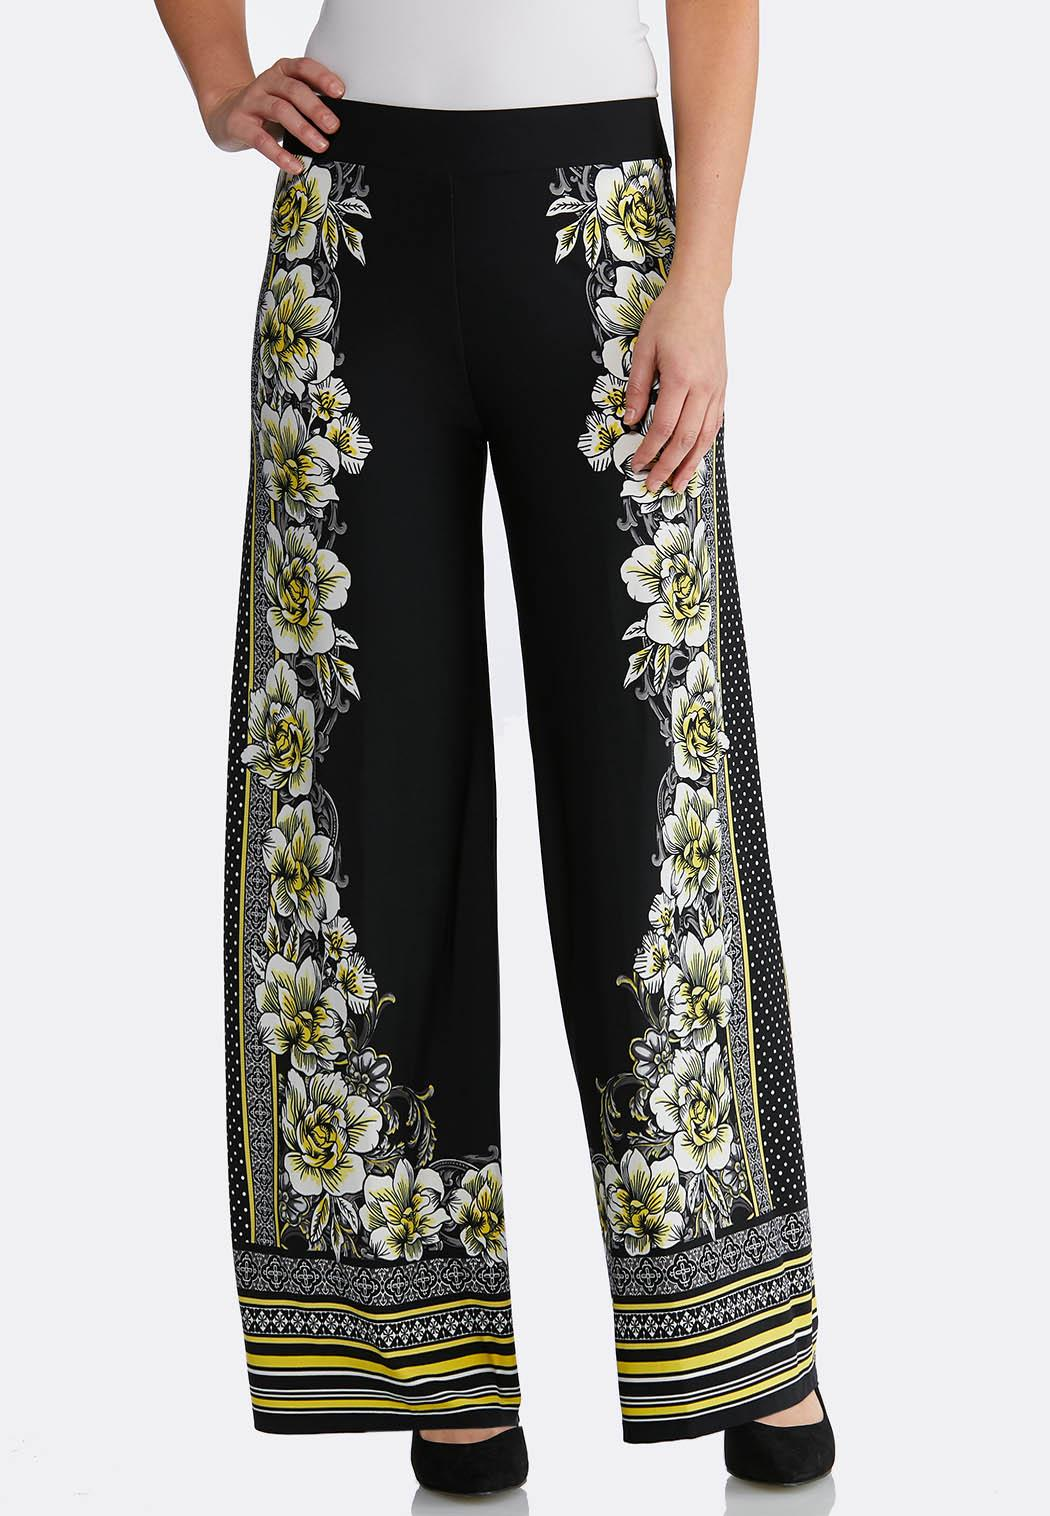 6031022229f Women s Wide Leg Pants sizes 2-16